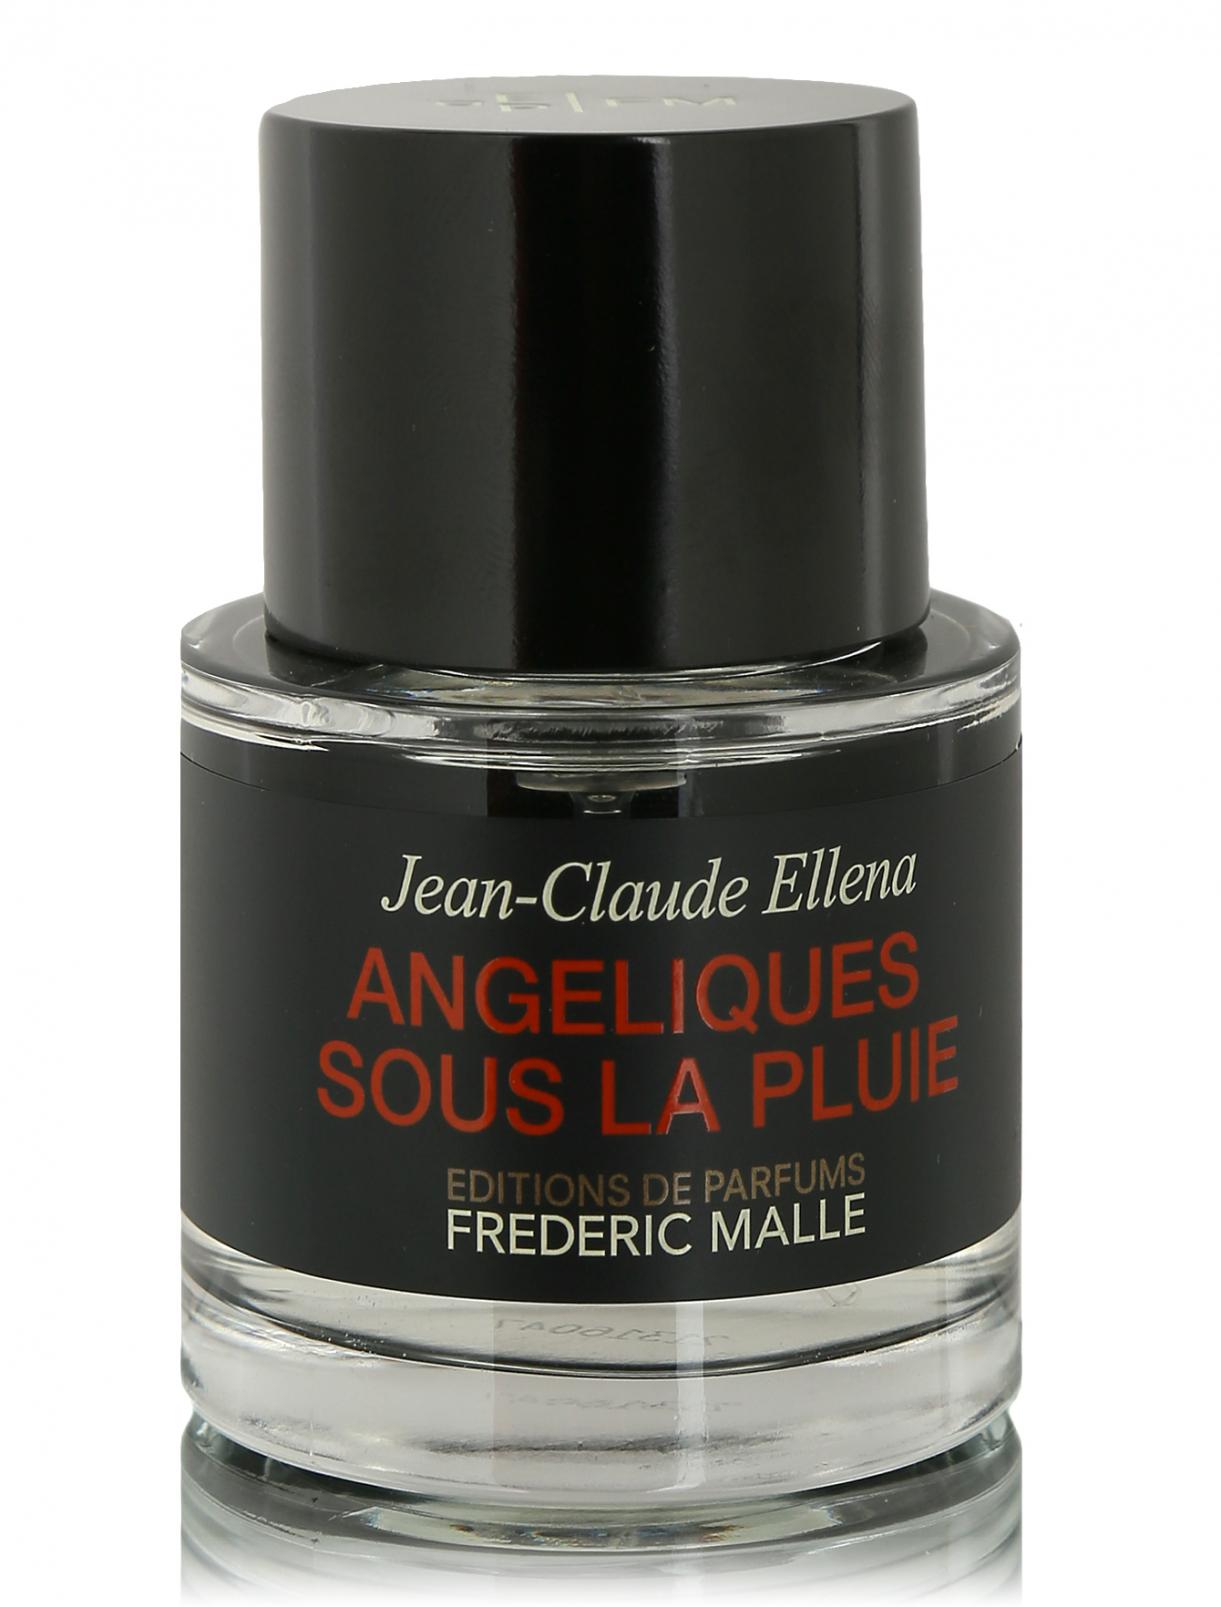 Парфюмерная вода 50 мл Angeliques Sous La Pluie Frederic Malle  –  Общий вид